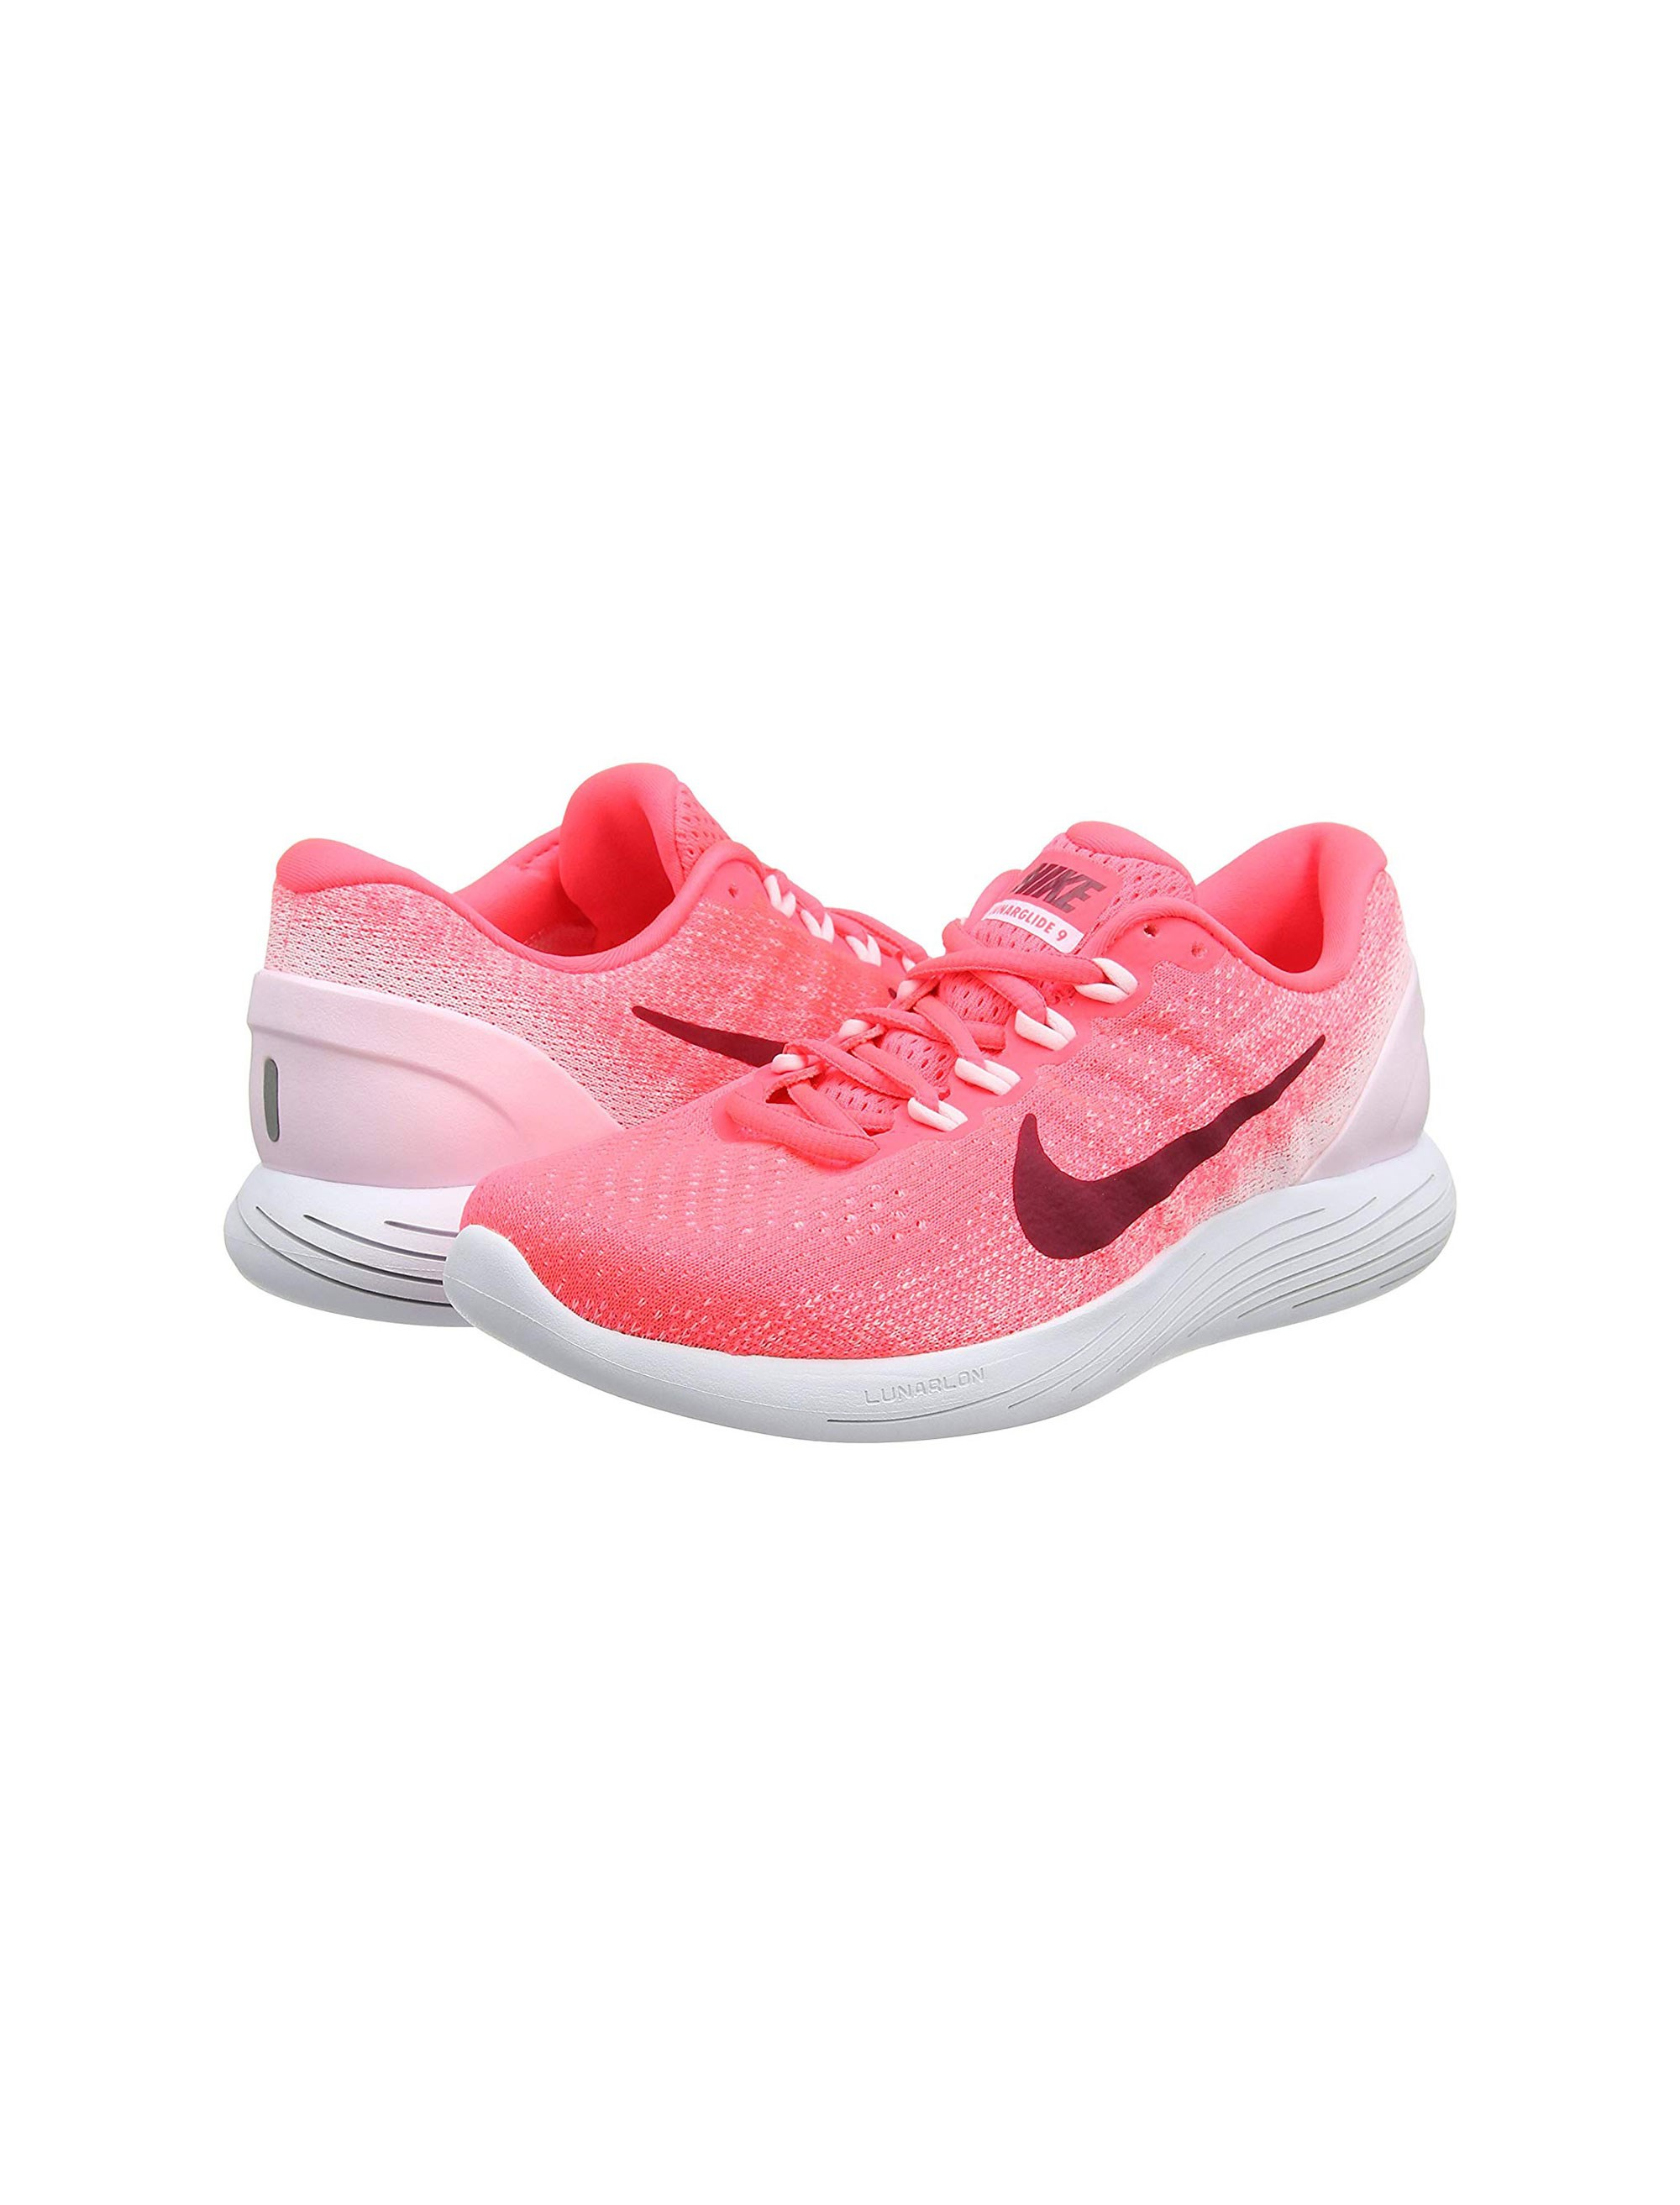 کفش دویدن بندی زنانه Lunarglide 9 - نایکی